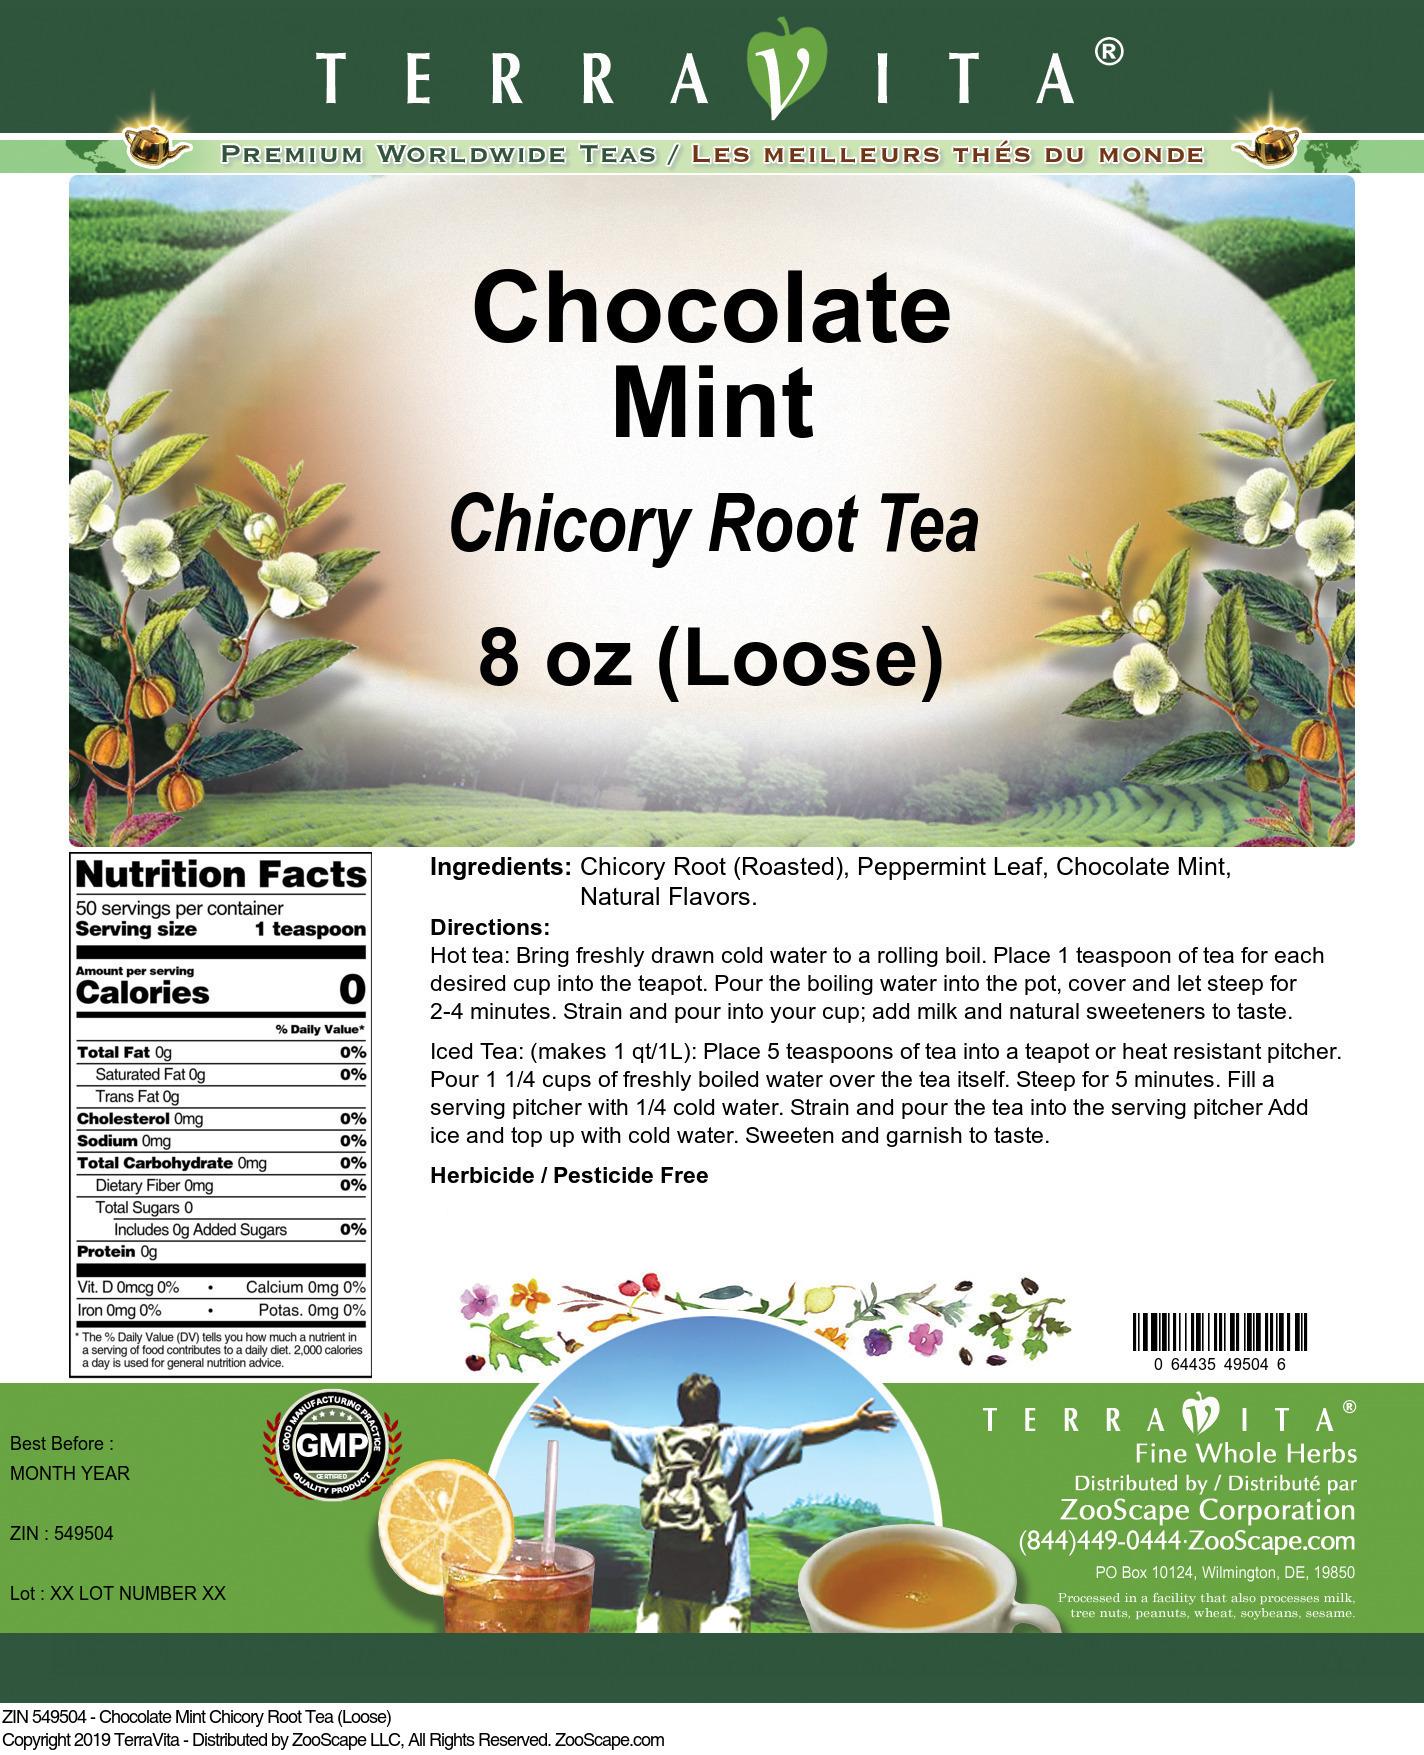 Chocolate Mint Chicory Root Tea (Loose)